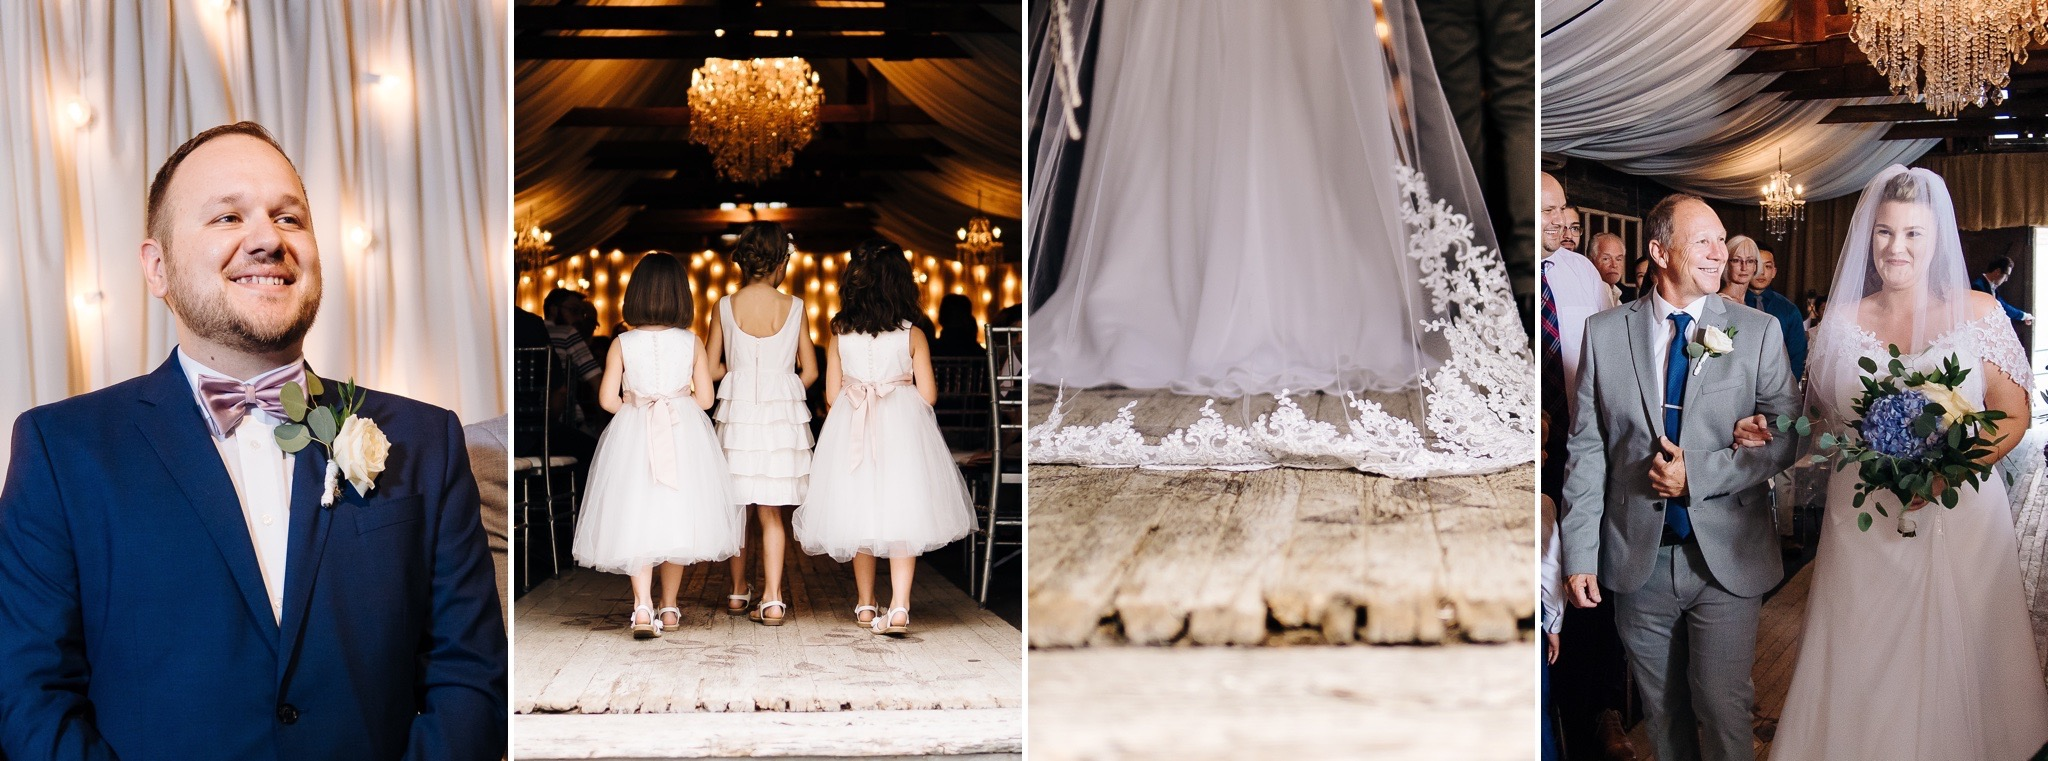 intimate_kyle_house_wedding_virginia_jonathan_hannah_photography-10.jpg